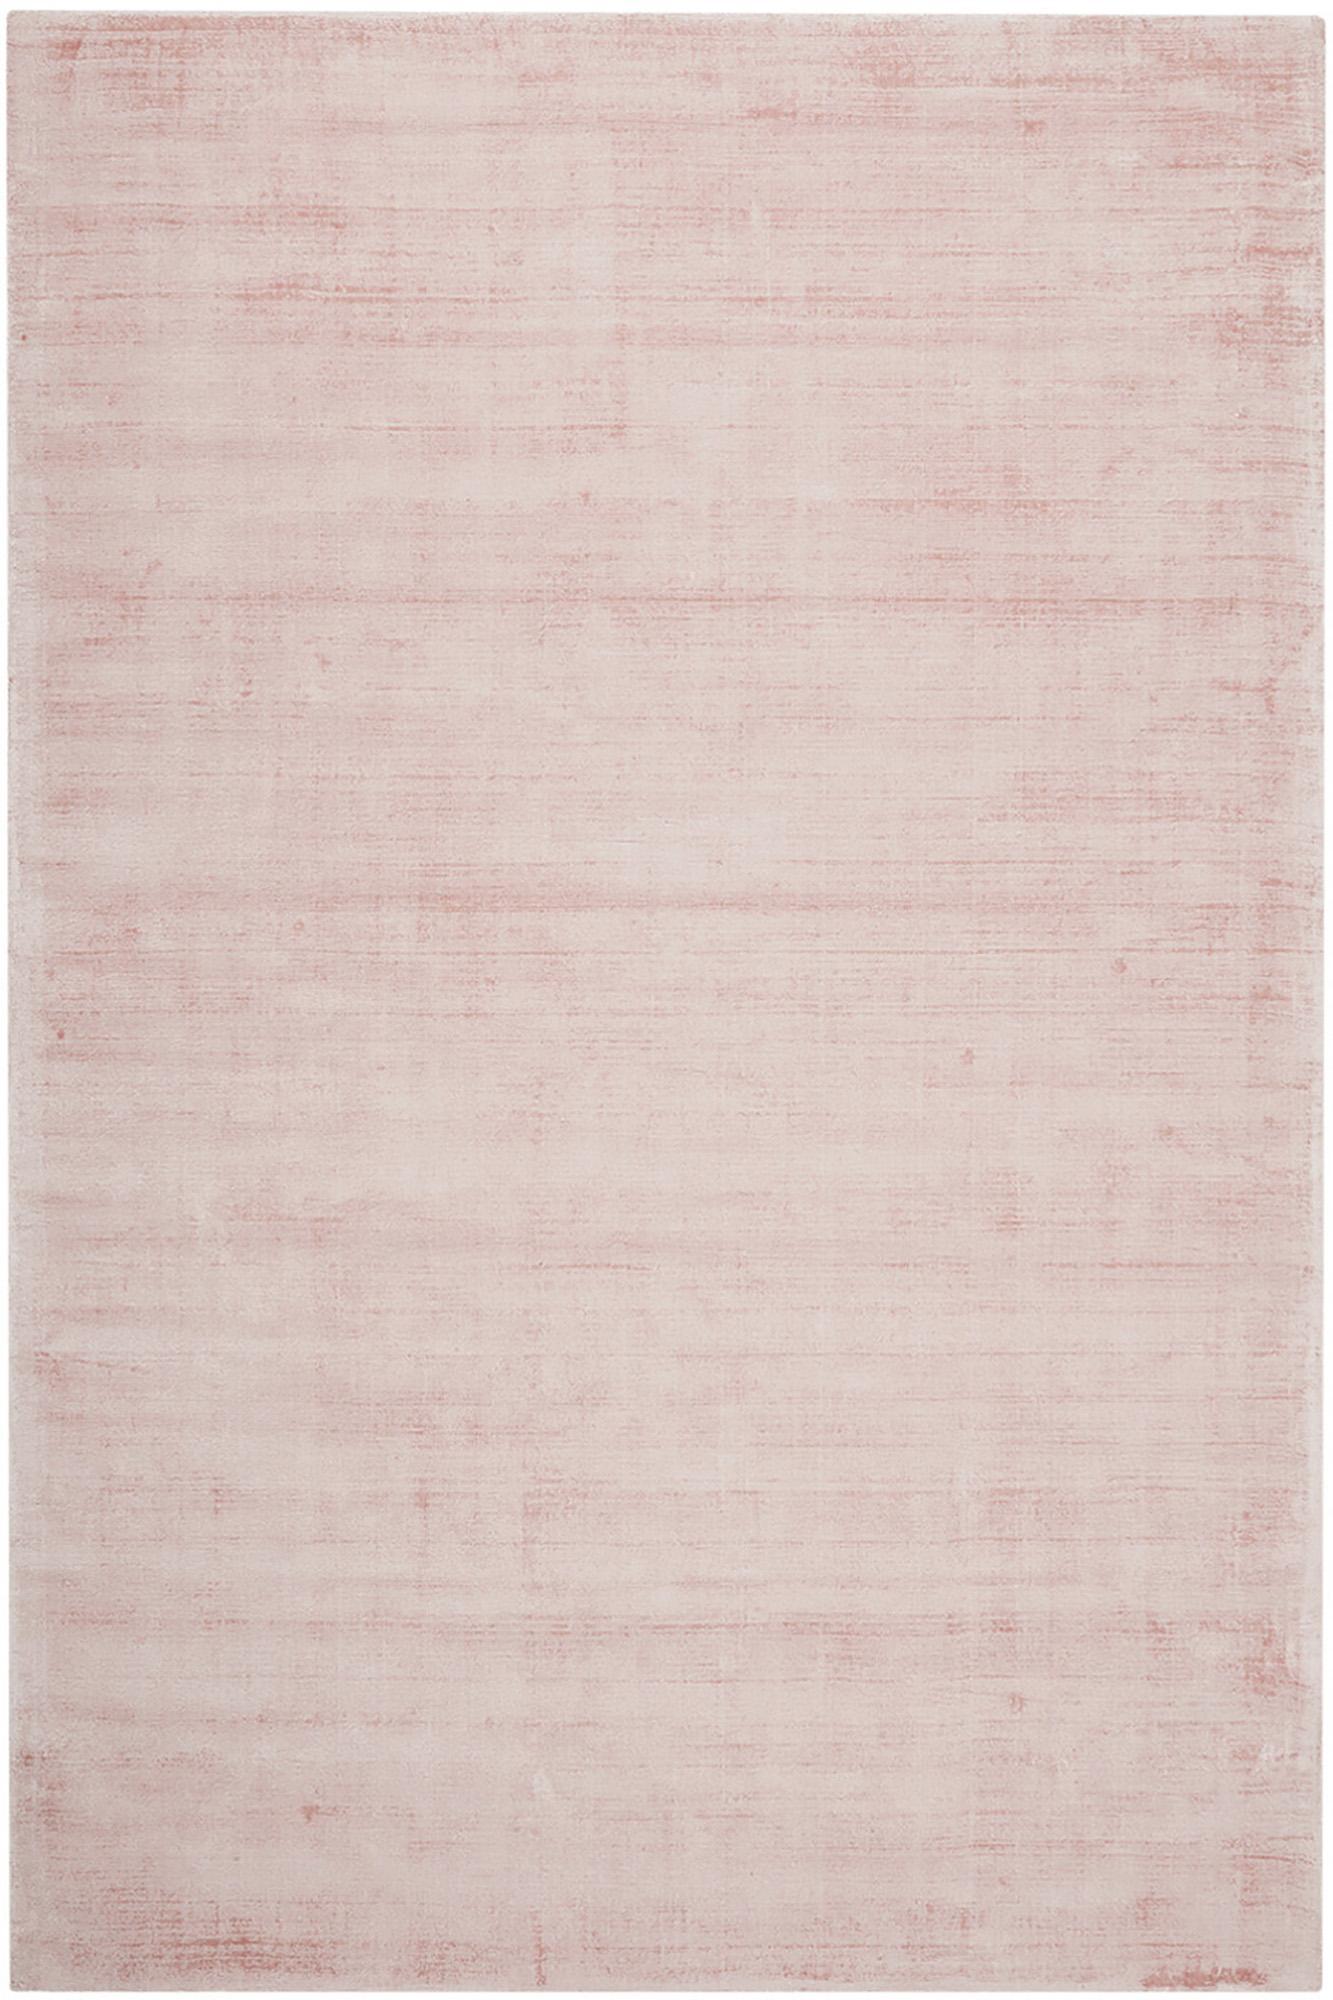 Handgewebter Viskoseteppich Jane in Rosa, Flor: 100% Viskose, Rosa, B 160 x L 230 cm (Größe M)